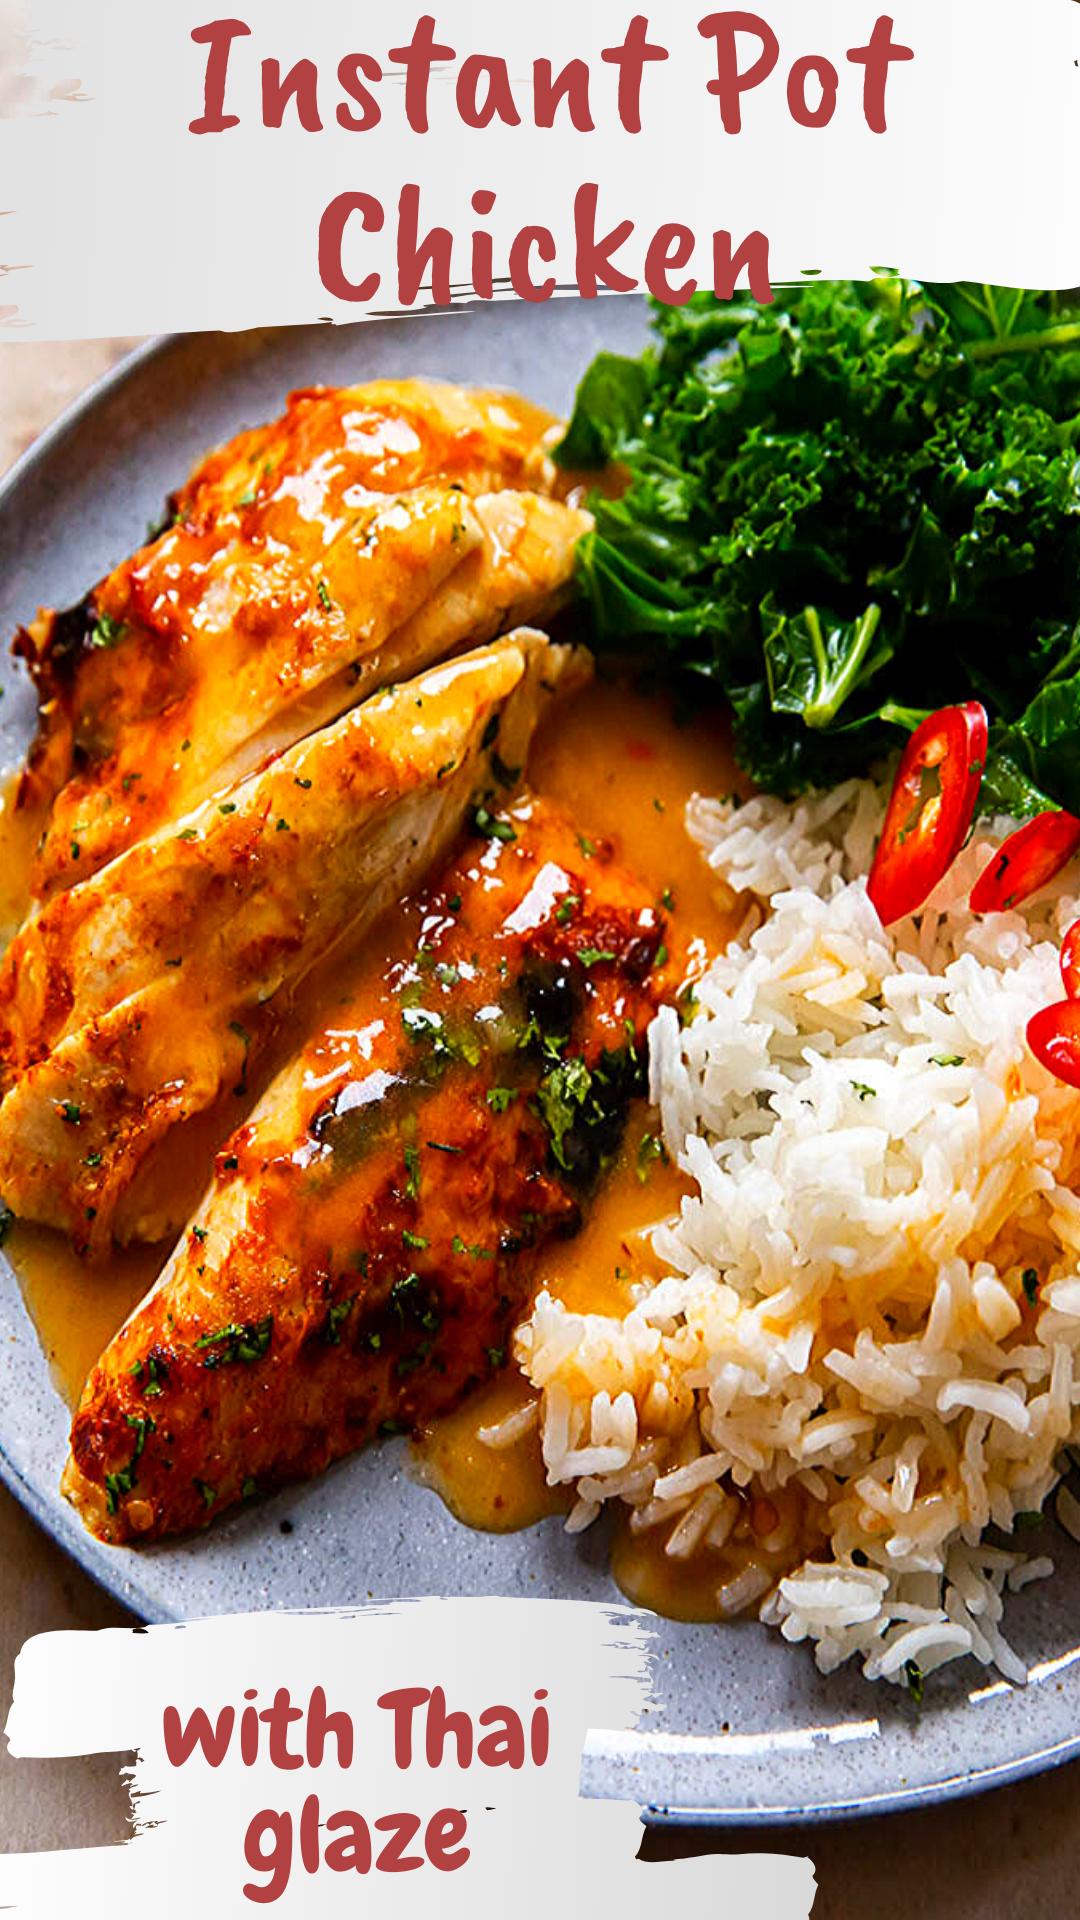 Instant Pot Whole Chicken Recipe In